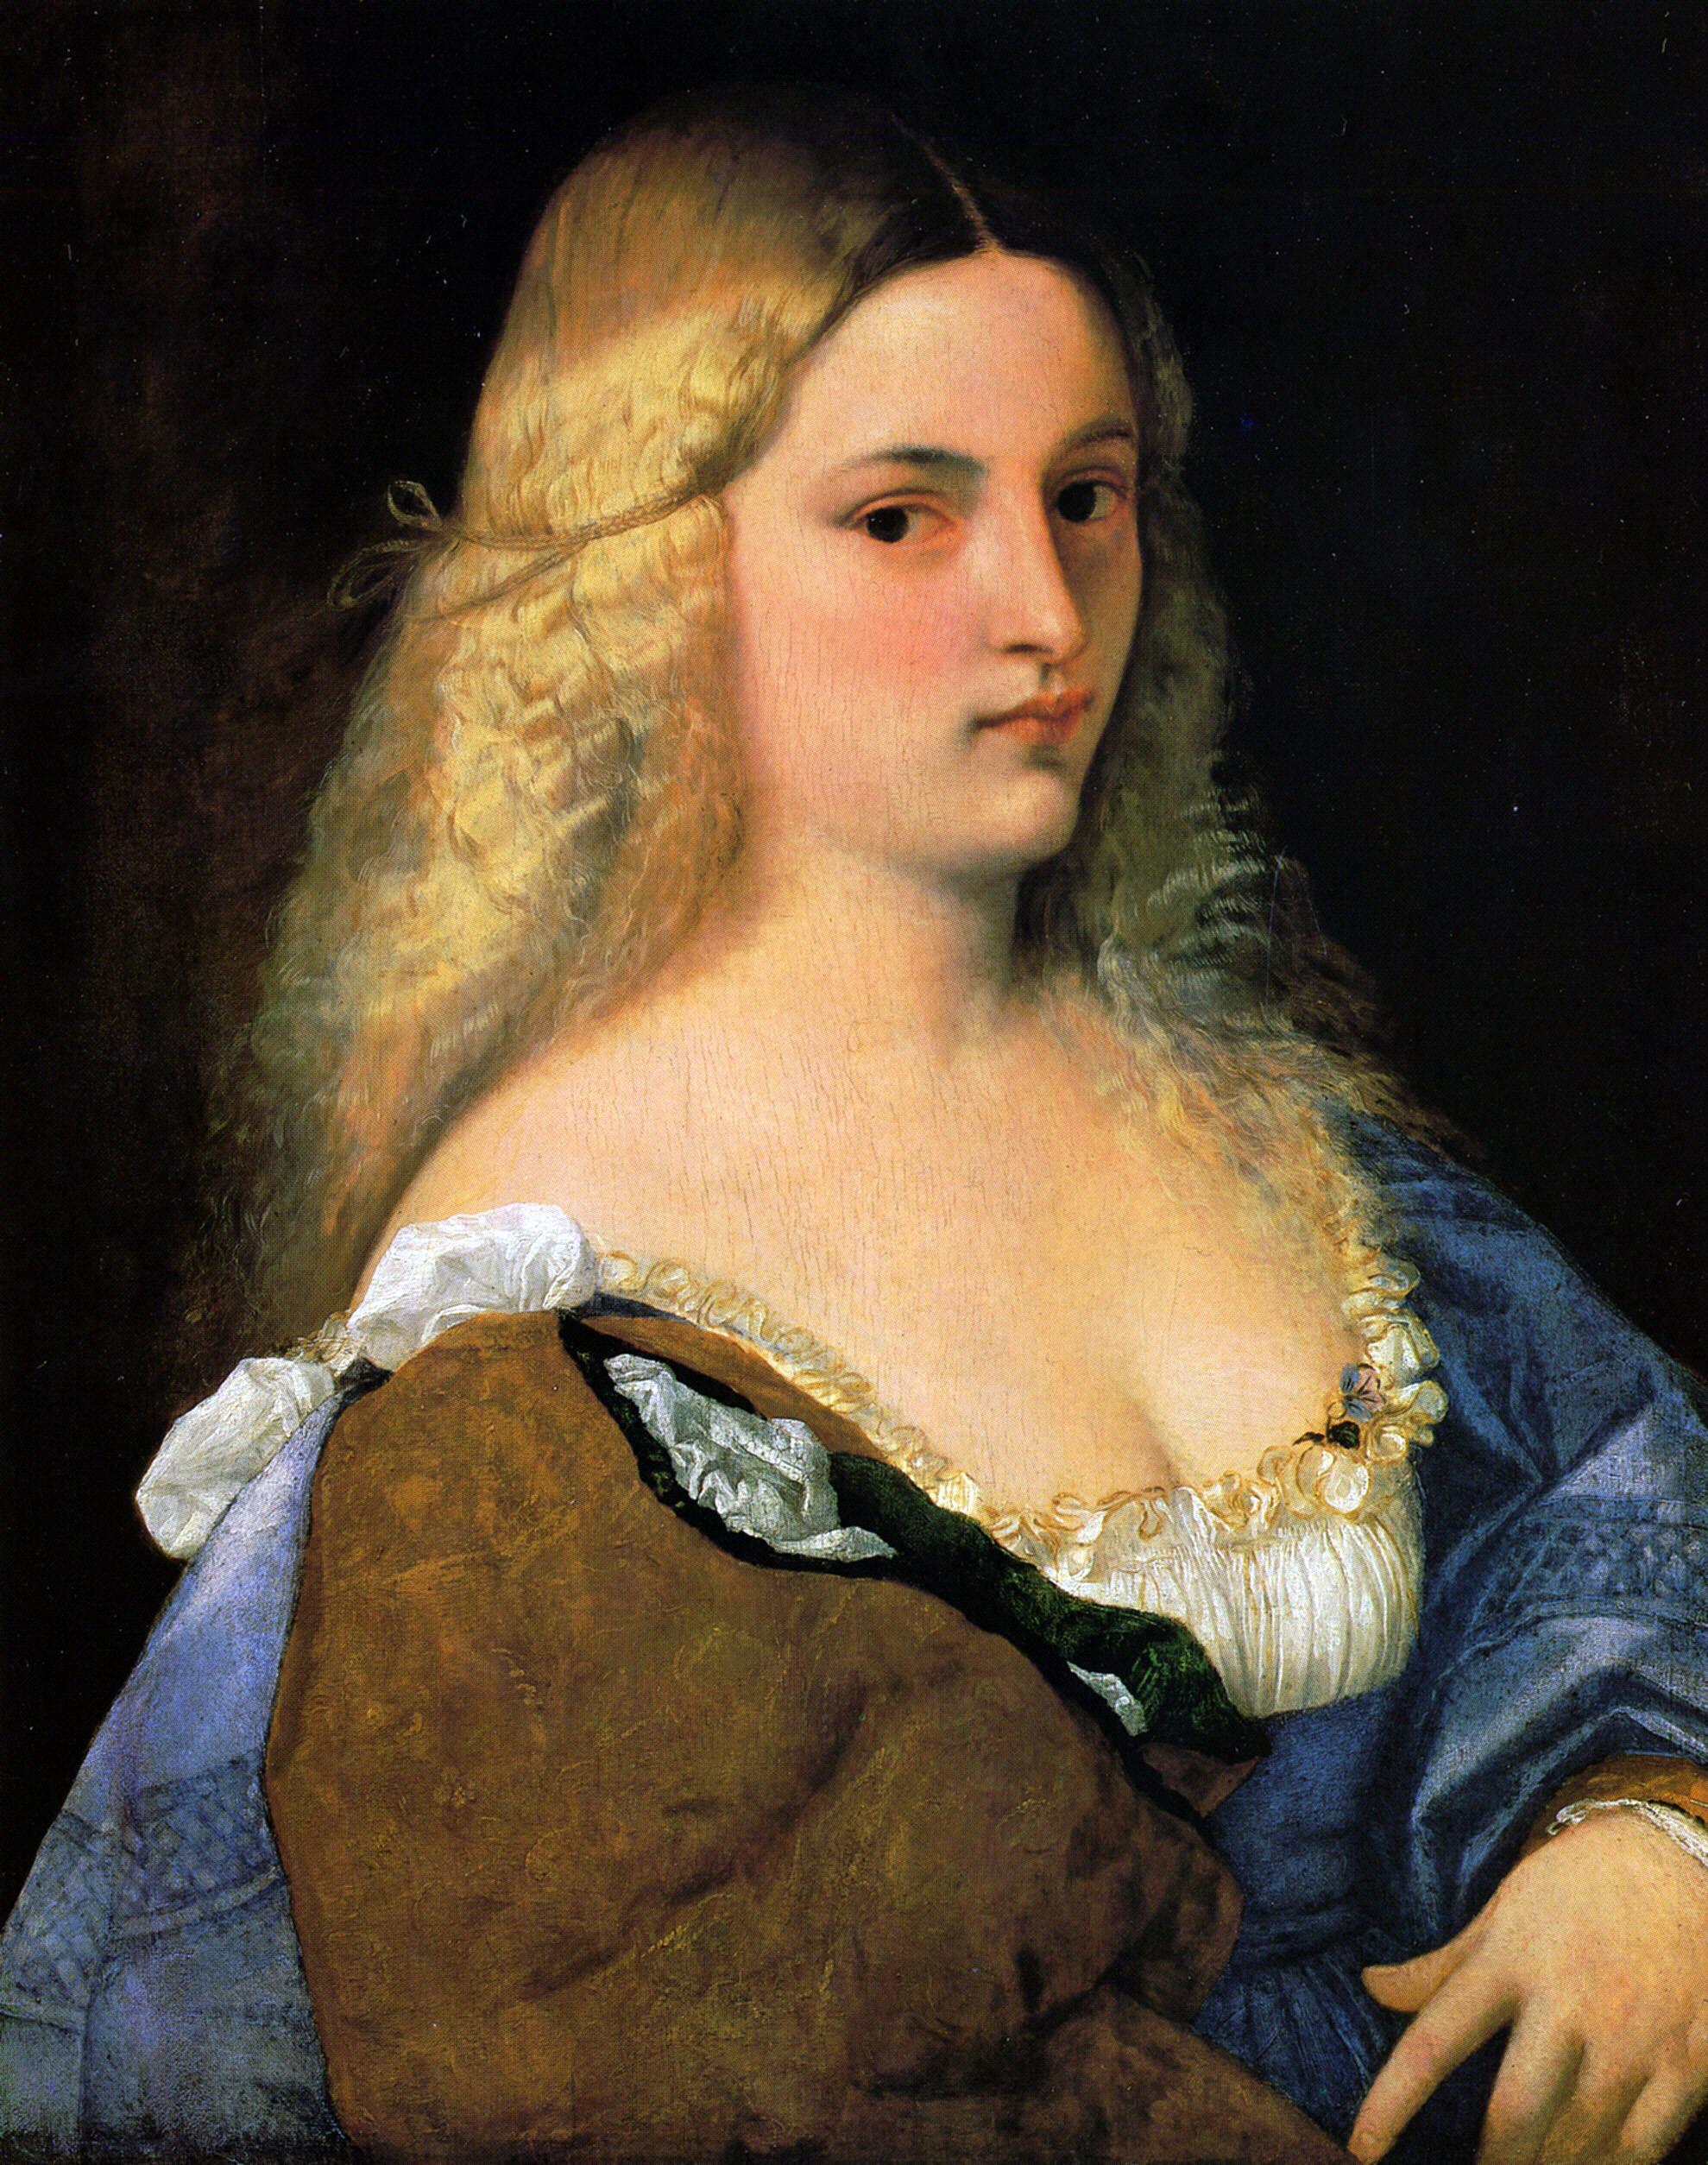 Violante - Titian - WikiArt.org - encyclopedia of visual arts